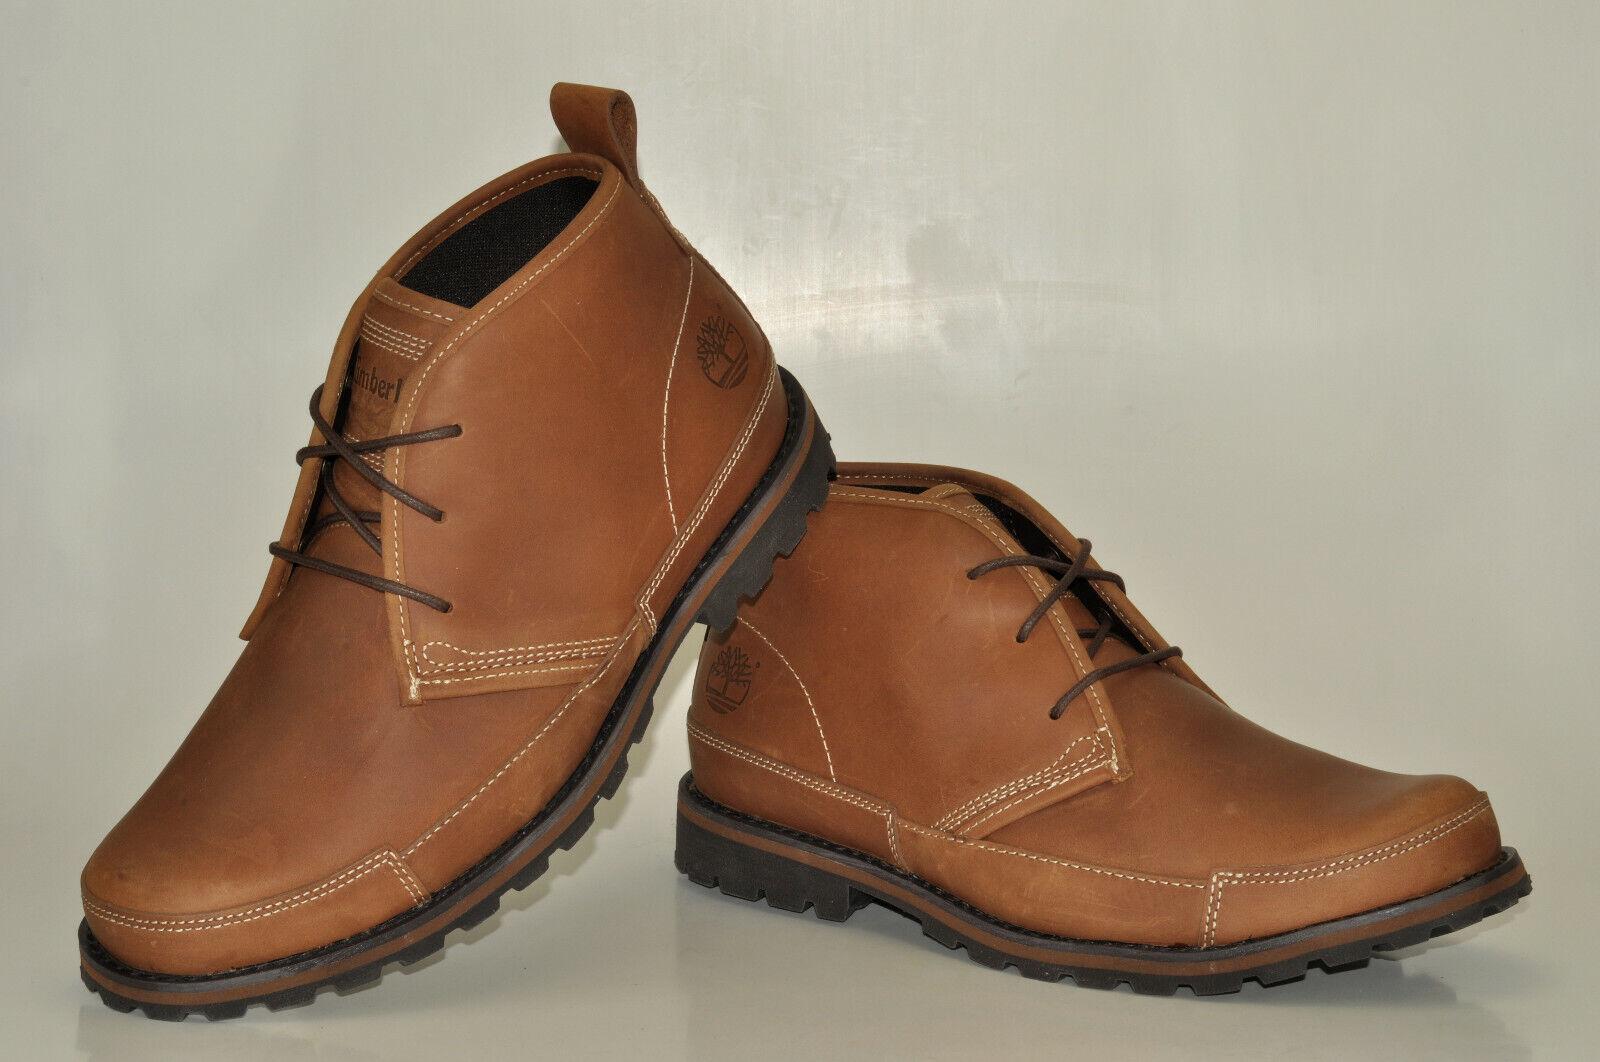 Timberland Barentsburg Chukka Boots Lace Up Men Shoes 74142